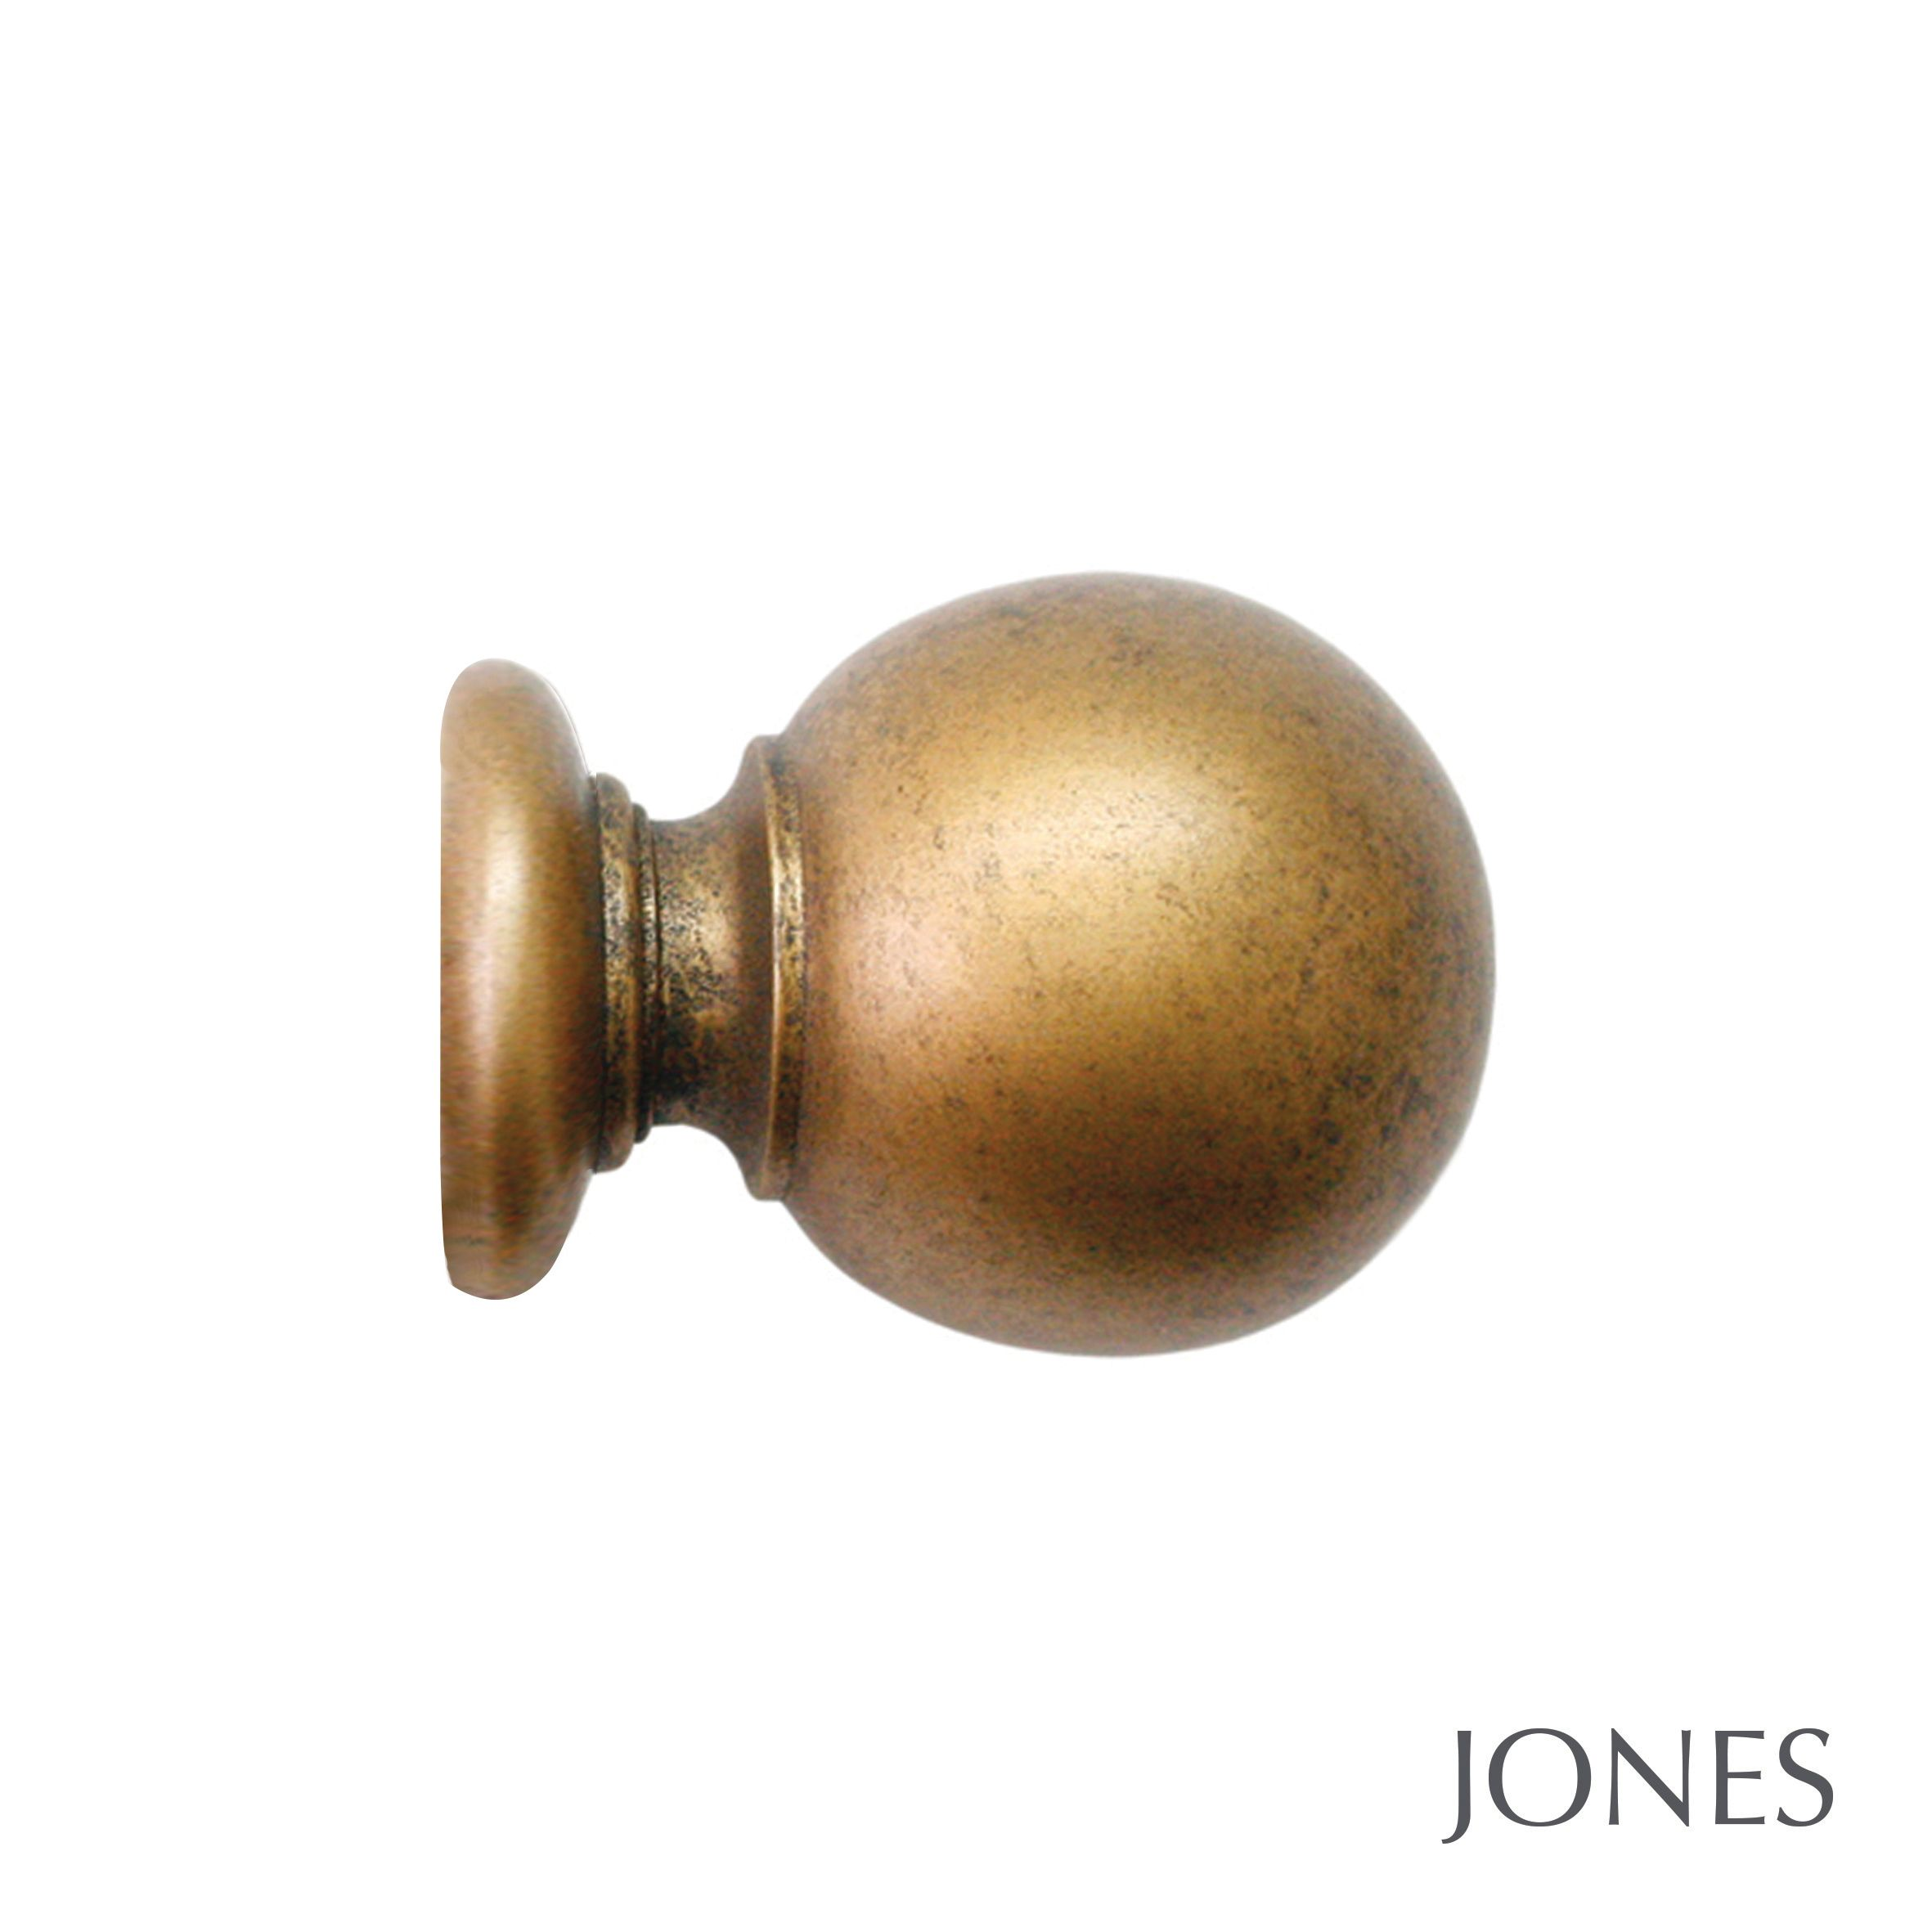 63mm Jones Grande Ball Finialantique gold